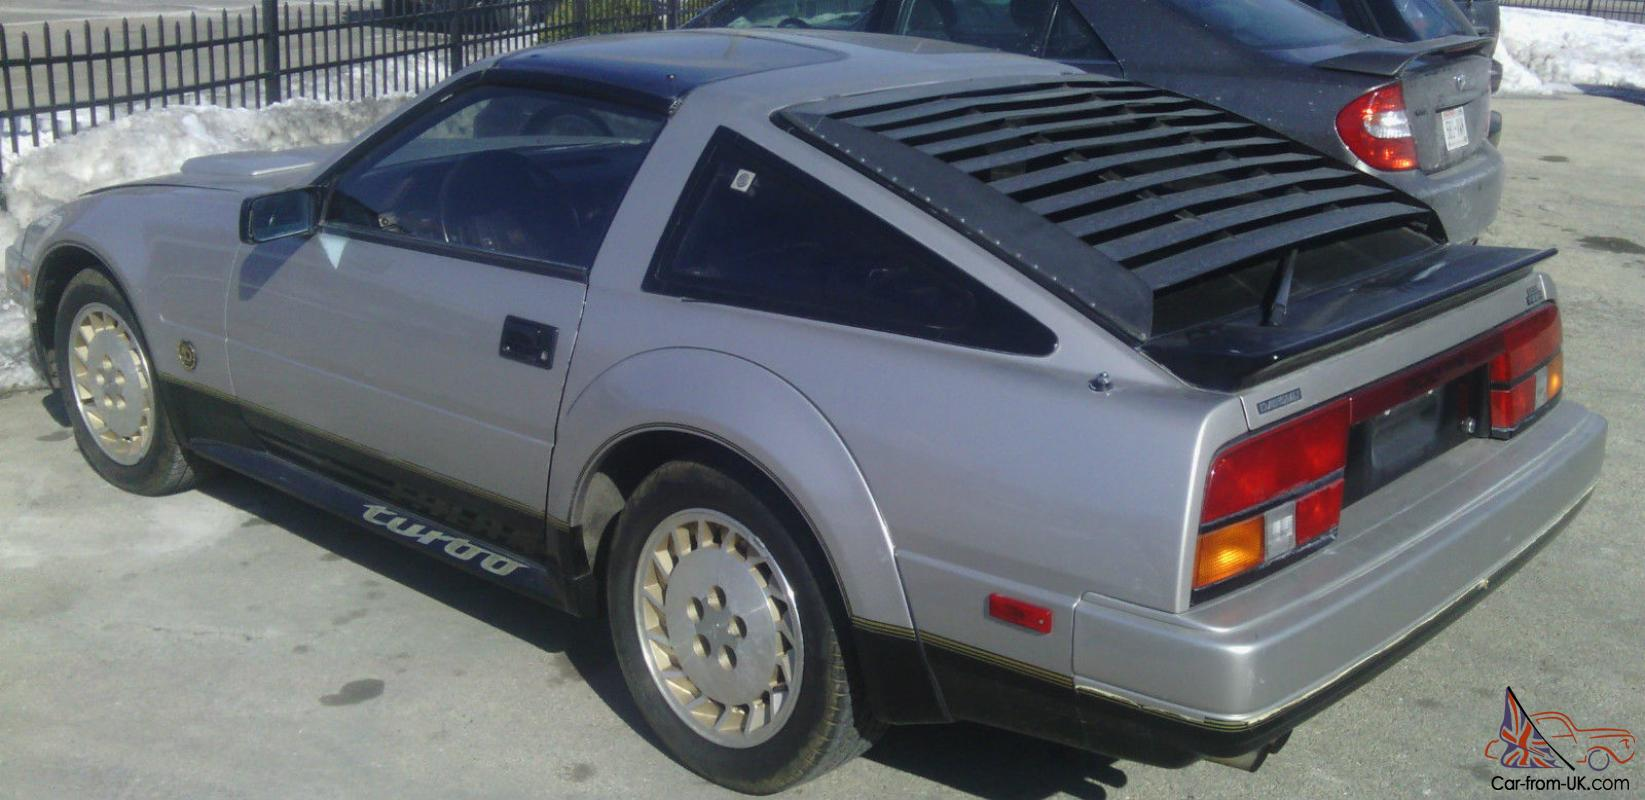 1984 Nissan 300zx Turbo 50th Anniversary Survivor 49 242 Original Miles Nr